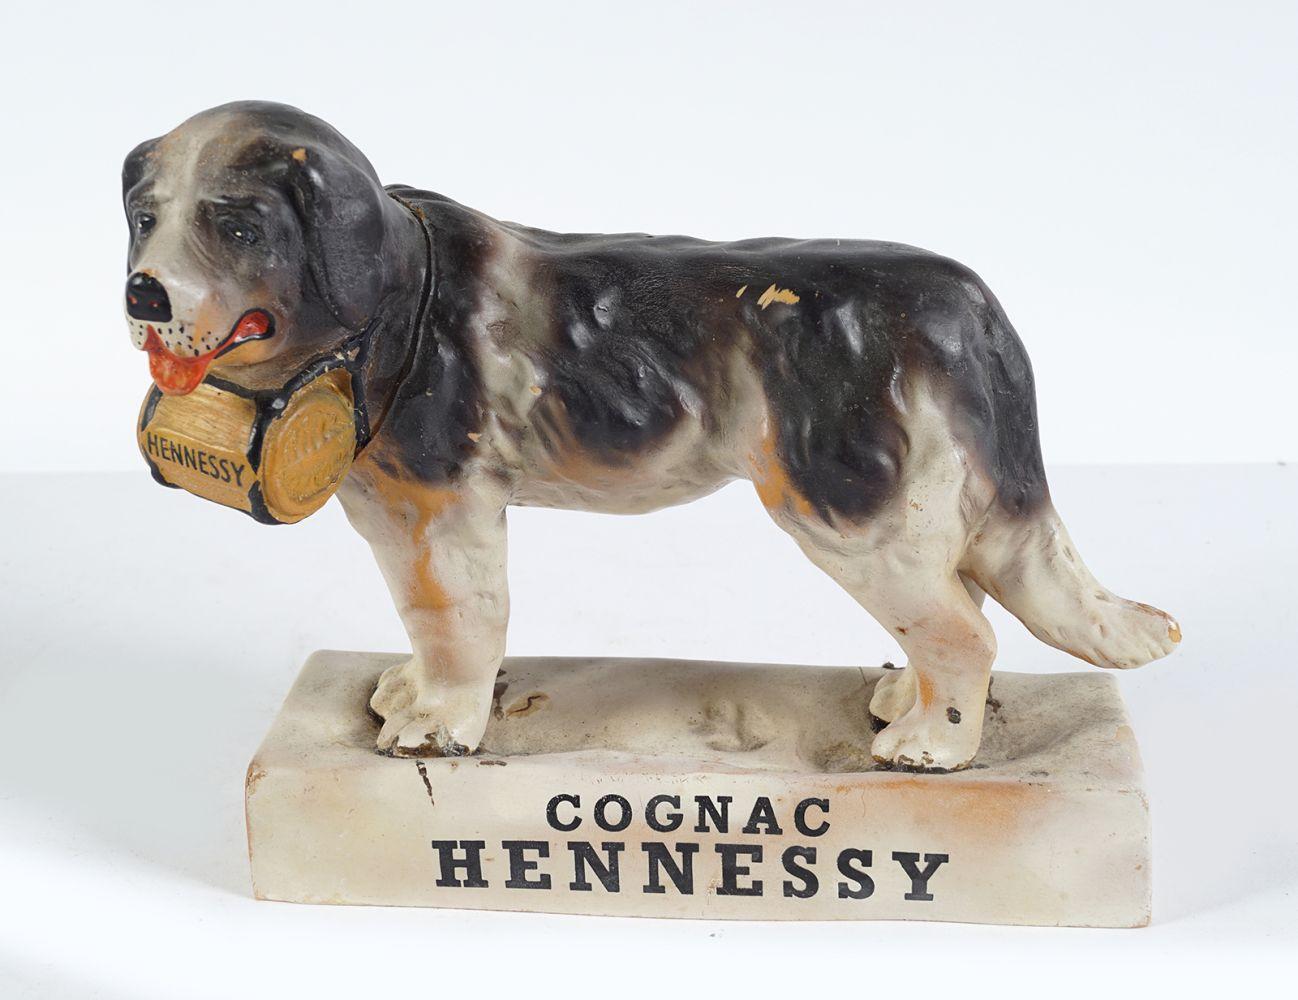 COGNAC HENNESSY ST. BERNARD FIGURINE